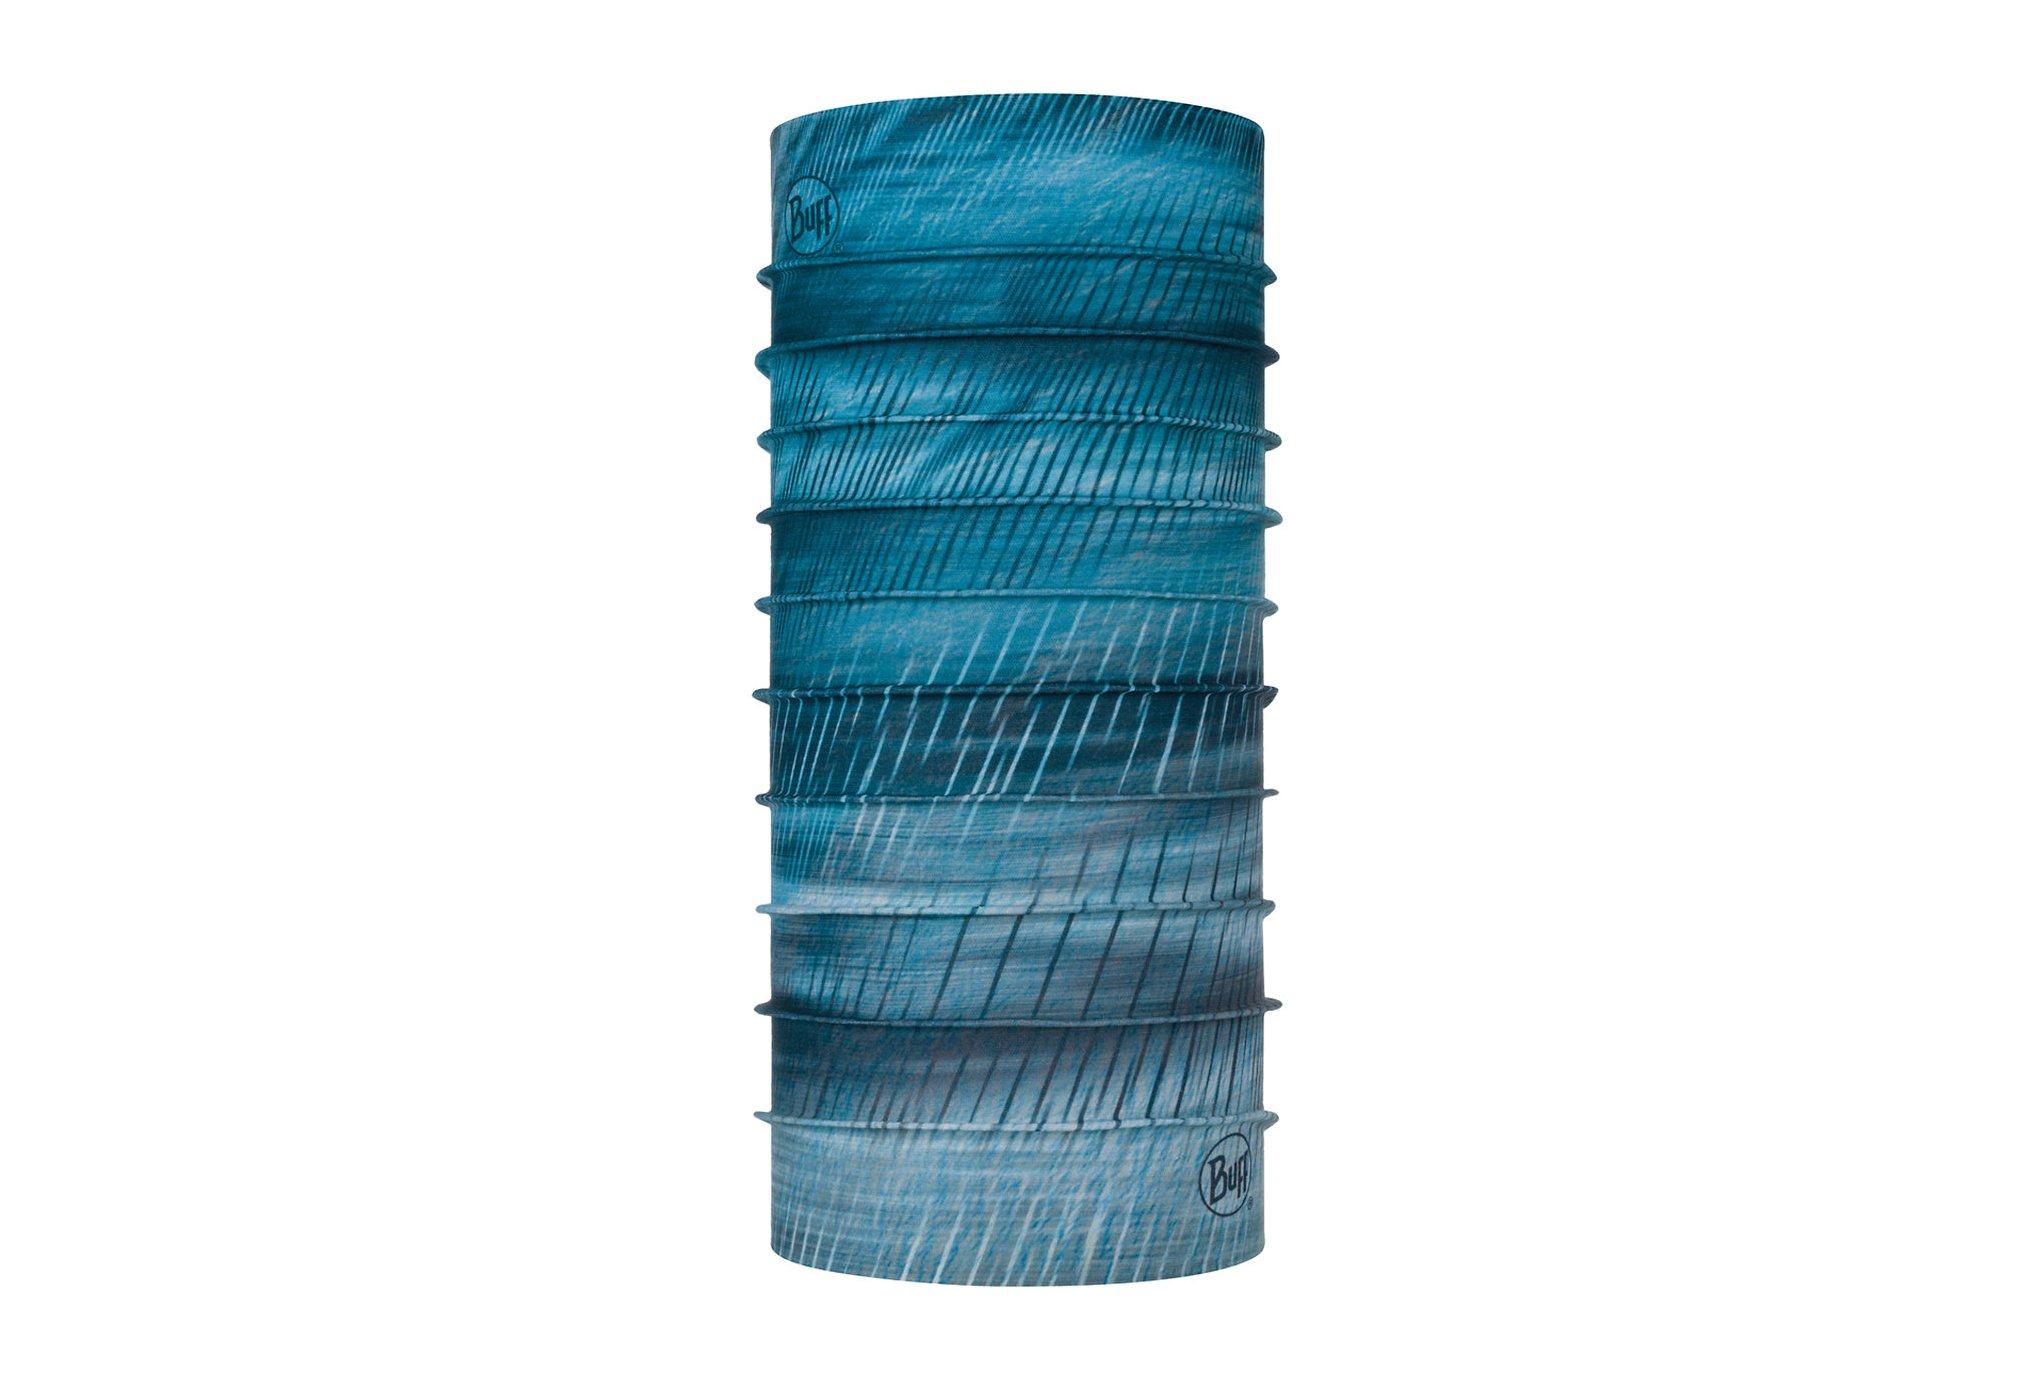 Buff Coolnet UV+ Keren Stone Blue Tours de cou